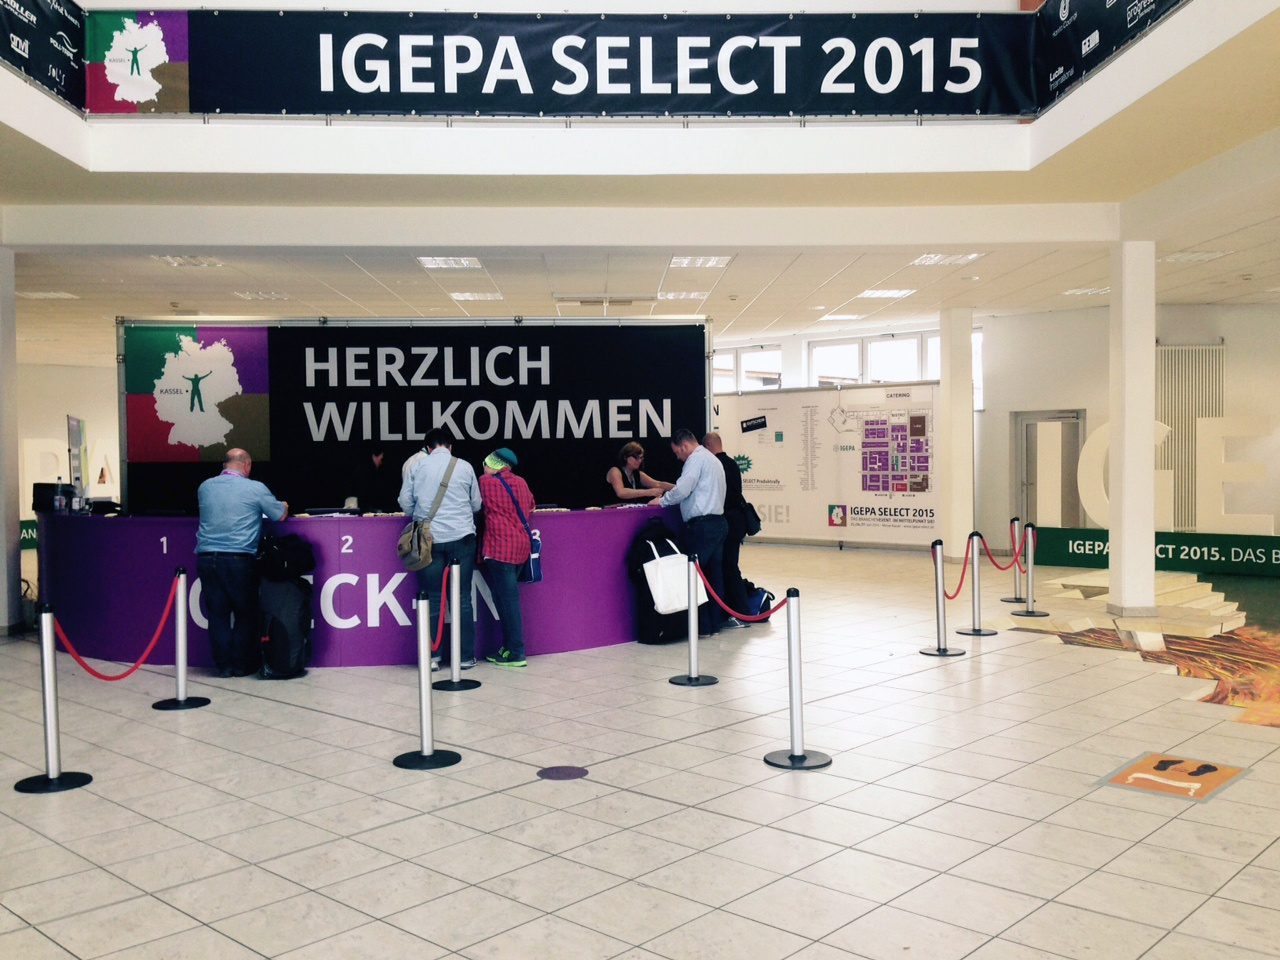 STAFIX Igepa select